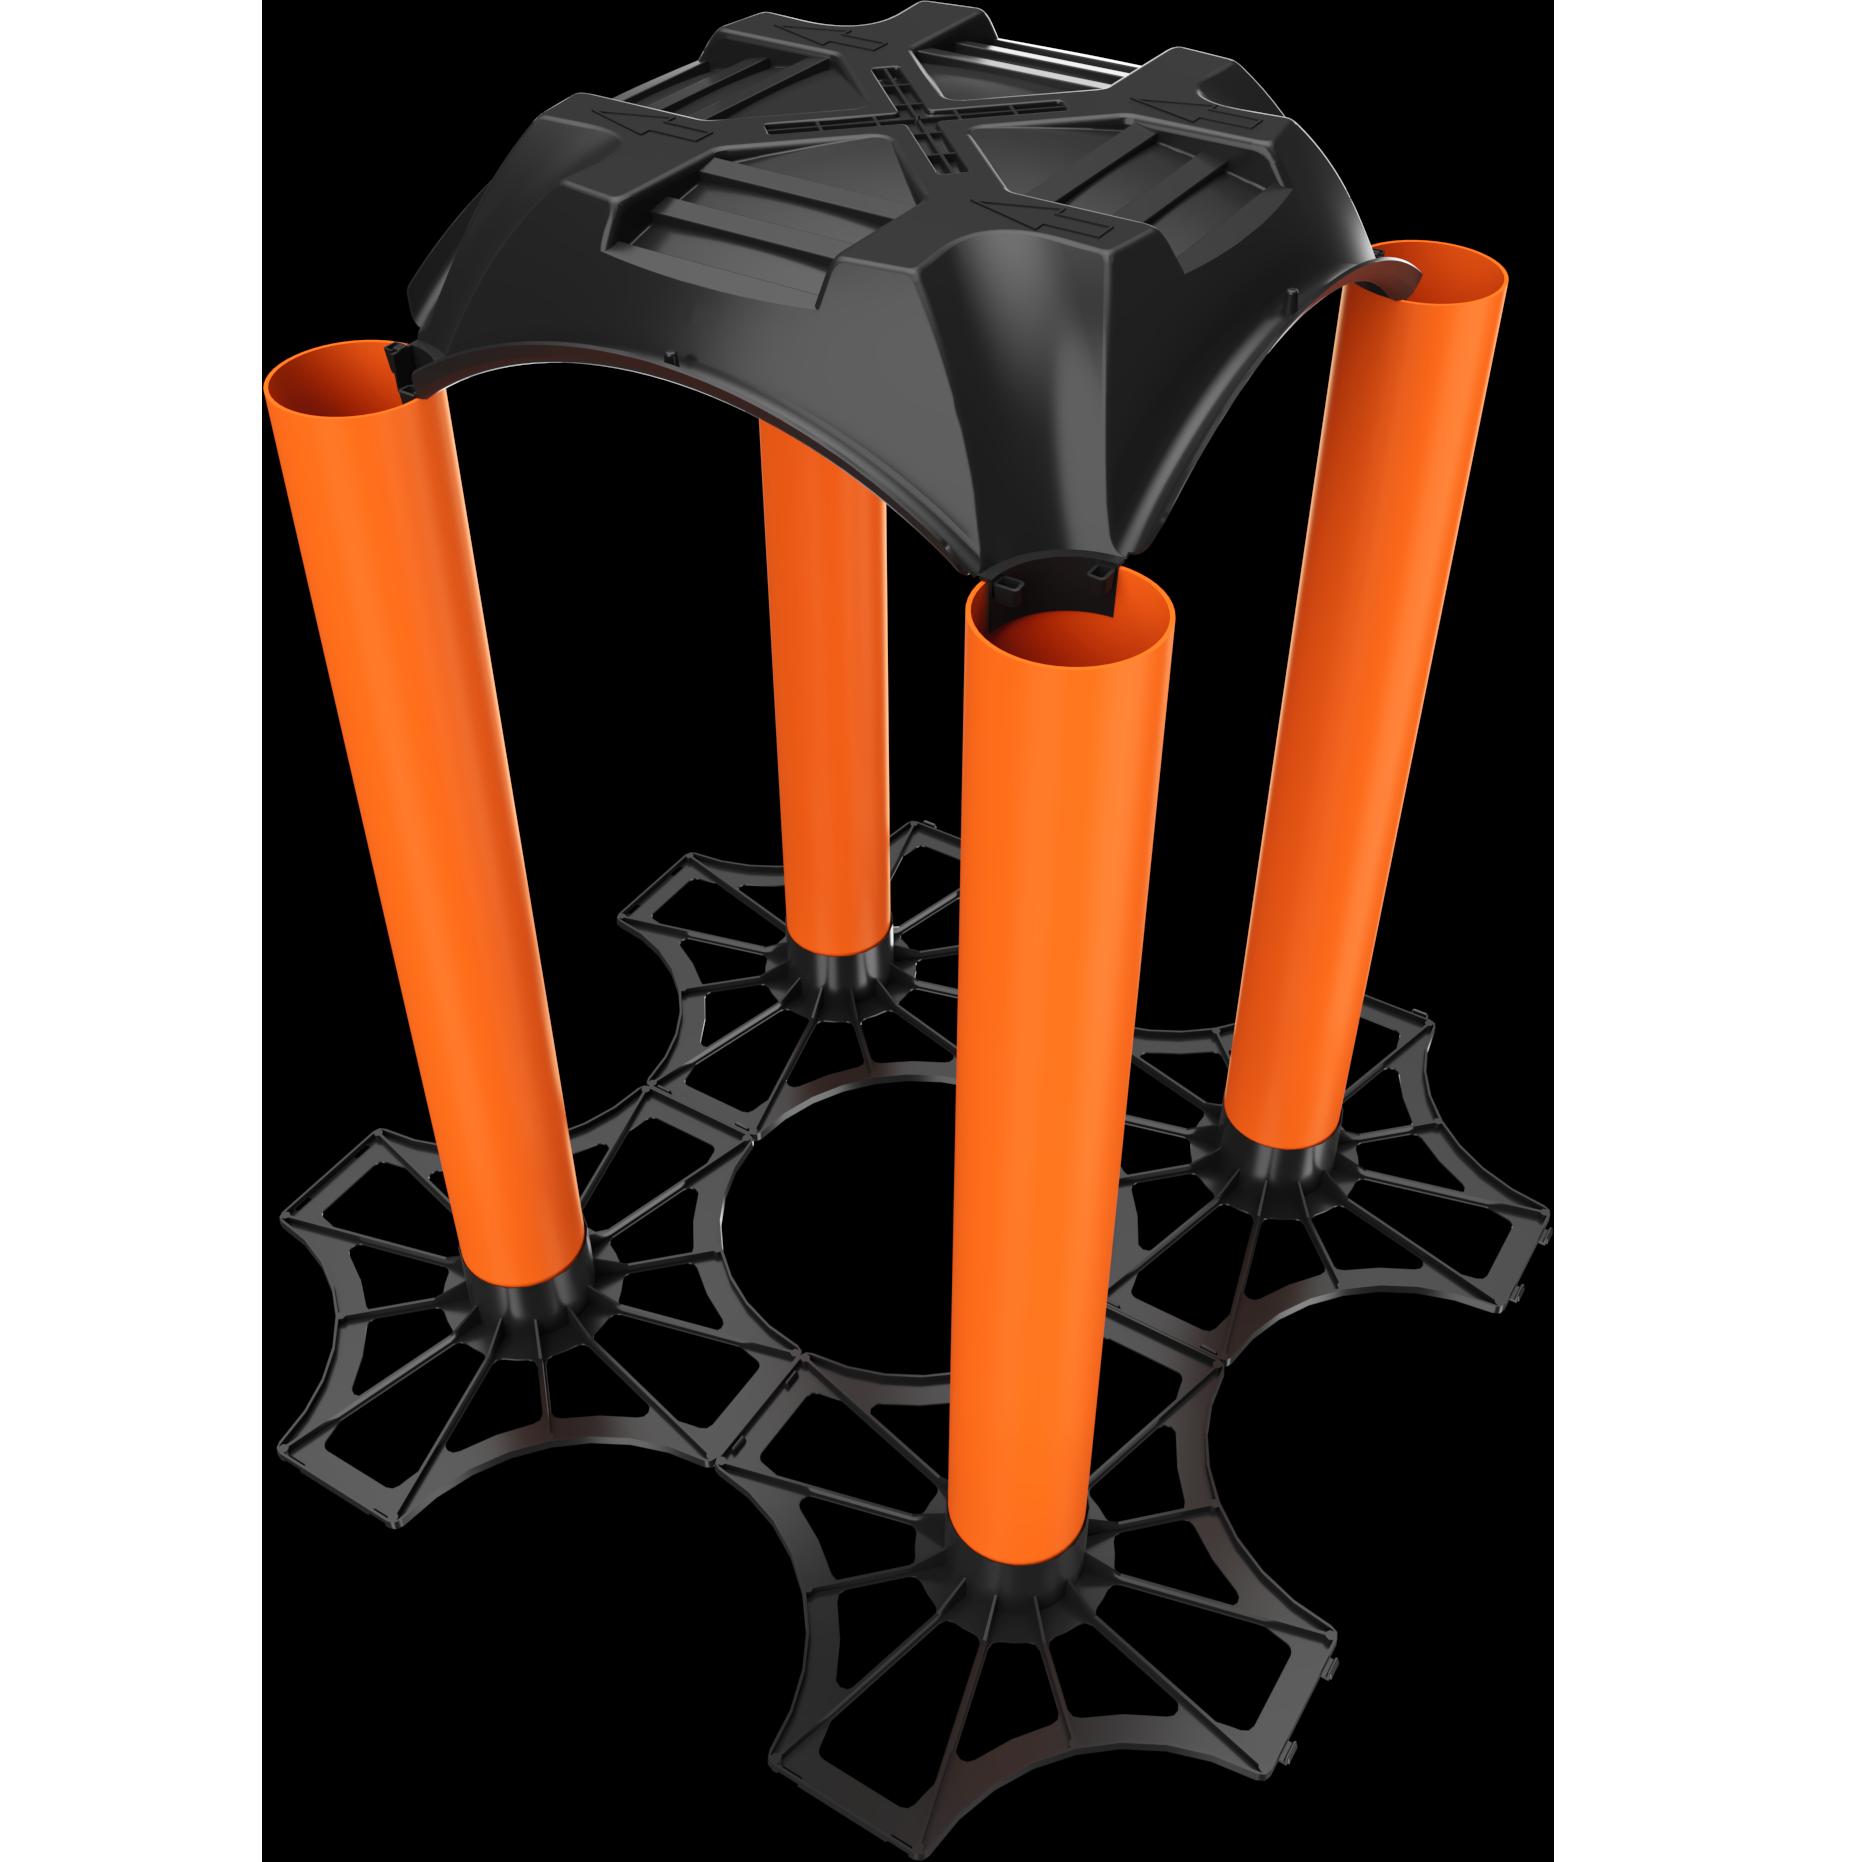 Geoplast New Elevetor modular element